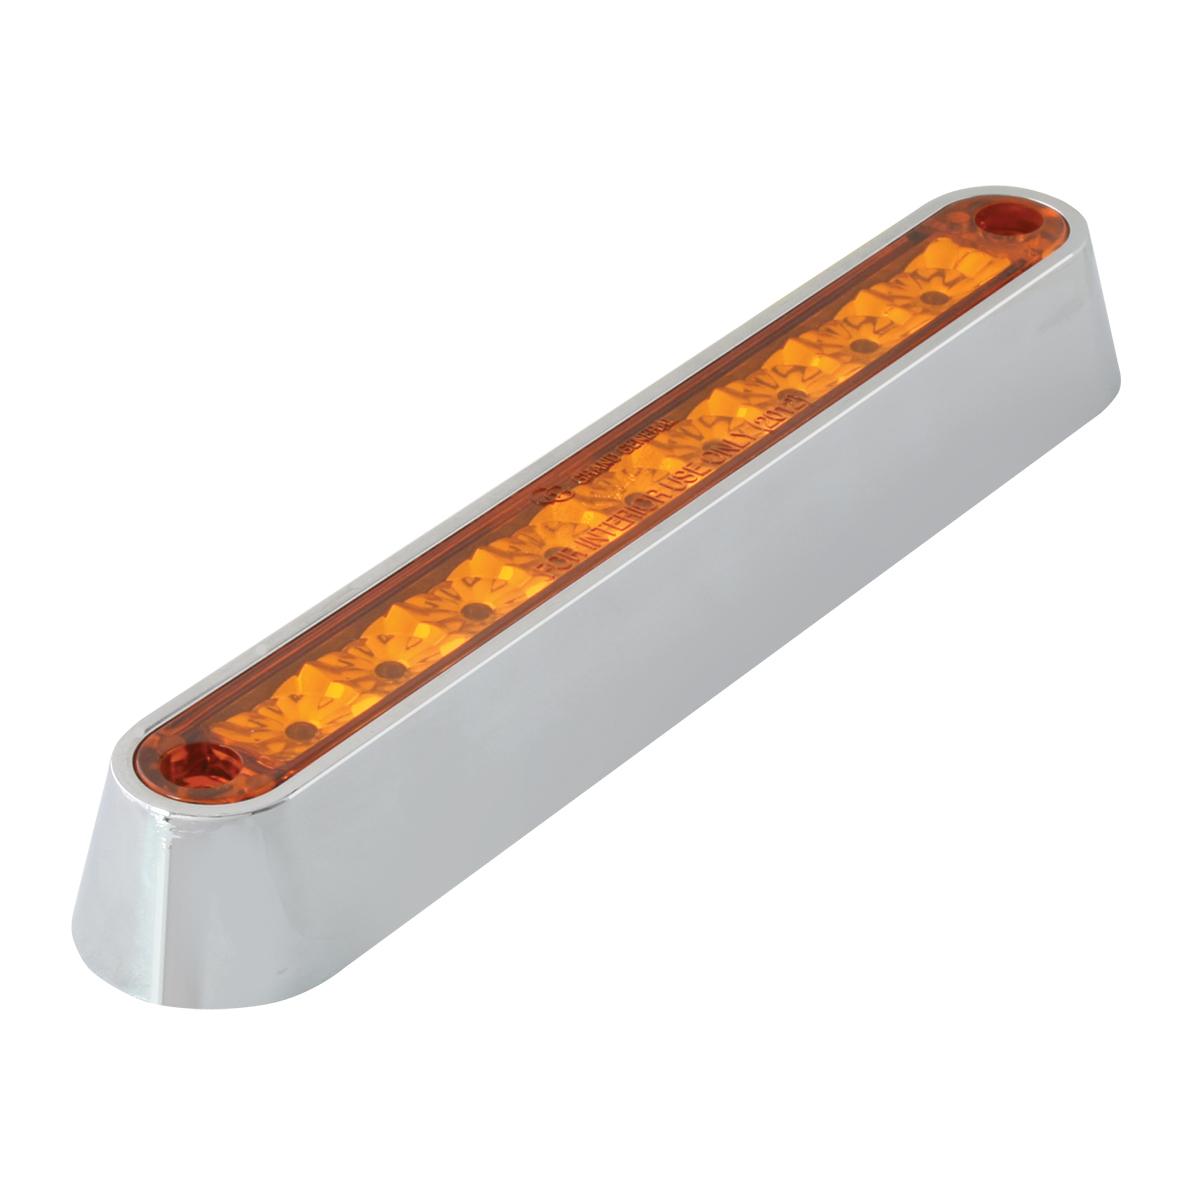 "76090 6.5"" Surface Mount LED Light Bar w/ Chrome Plastic Base"